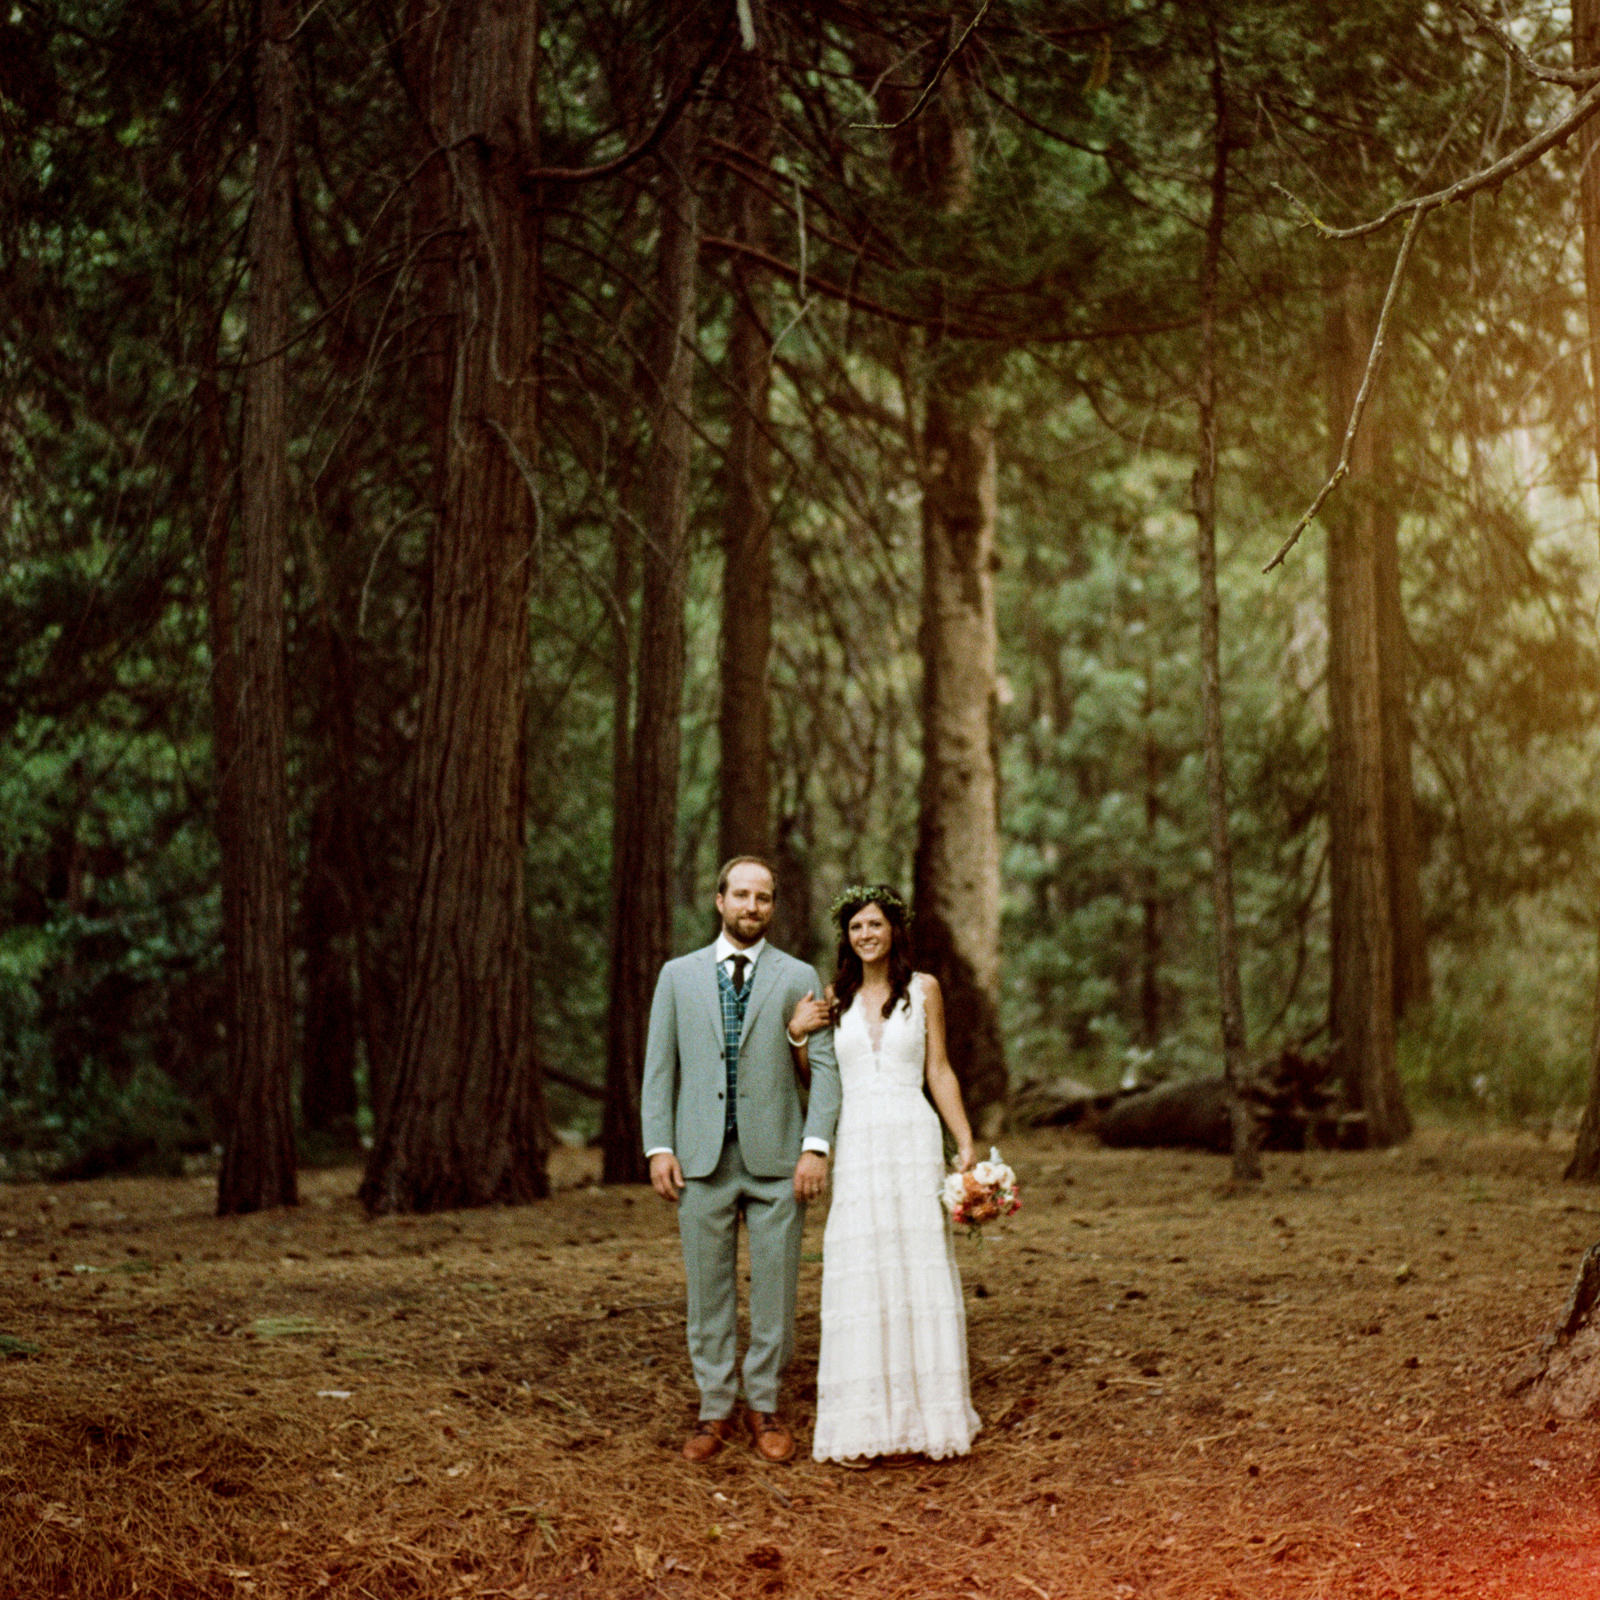 yosemite-intimate-wedding-101 YOSEMITE INTIMATE WEDDING